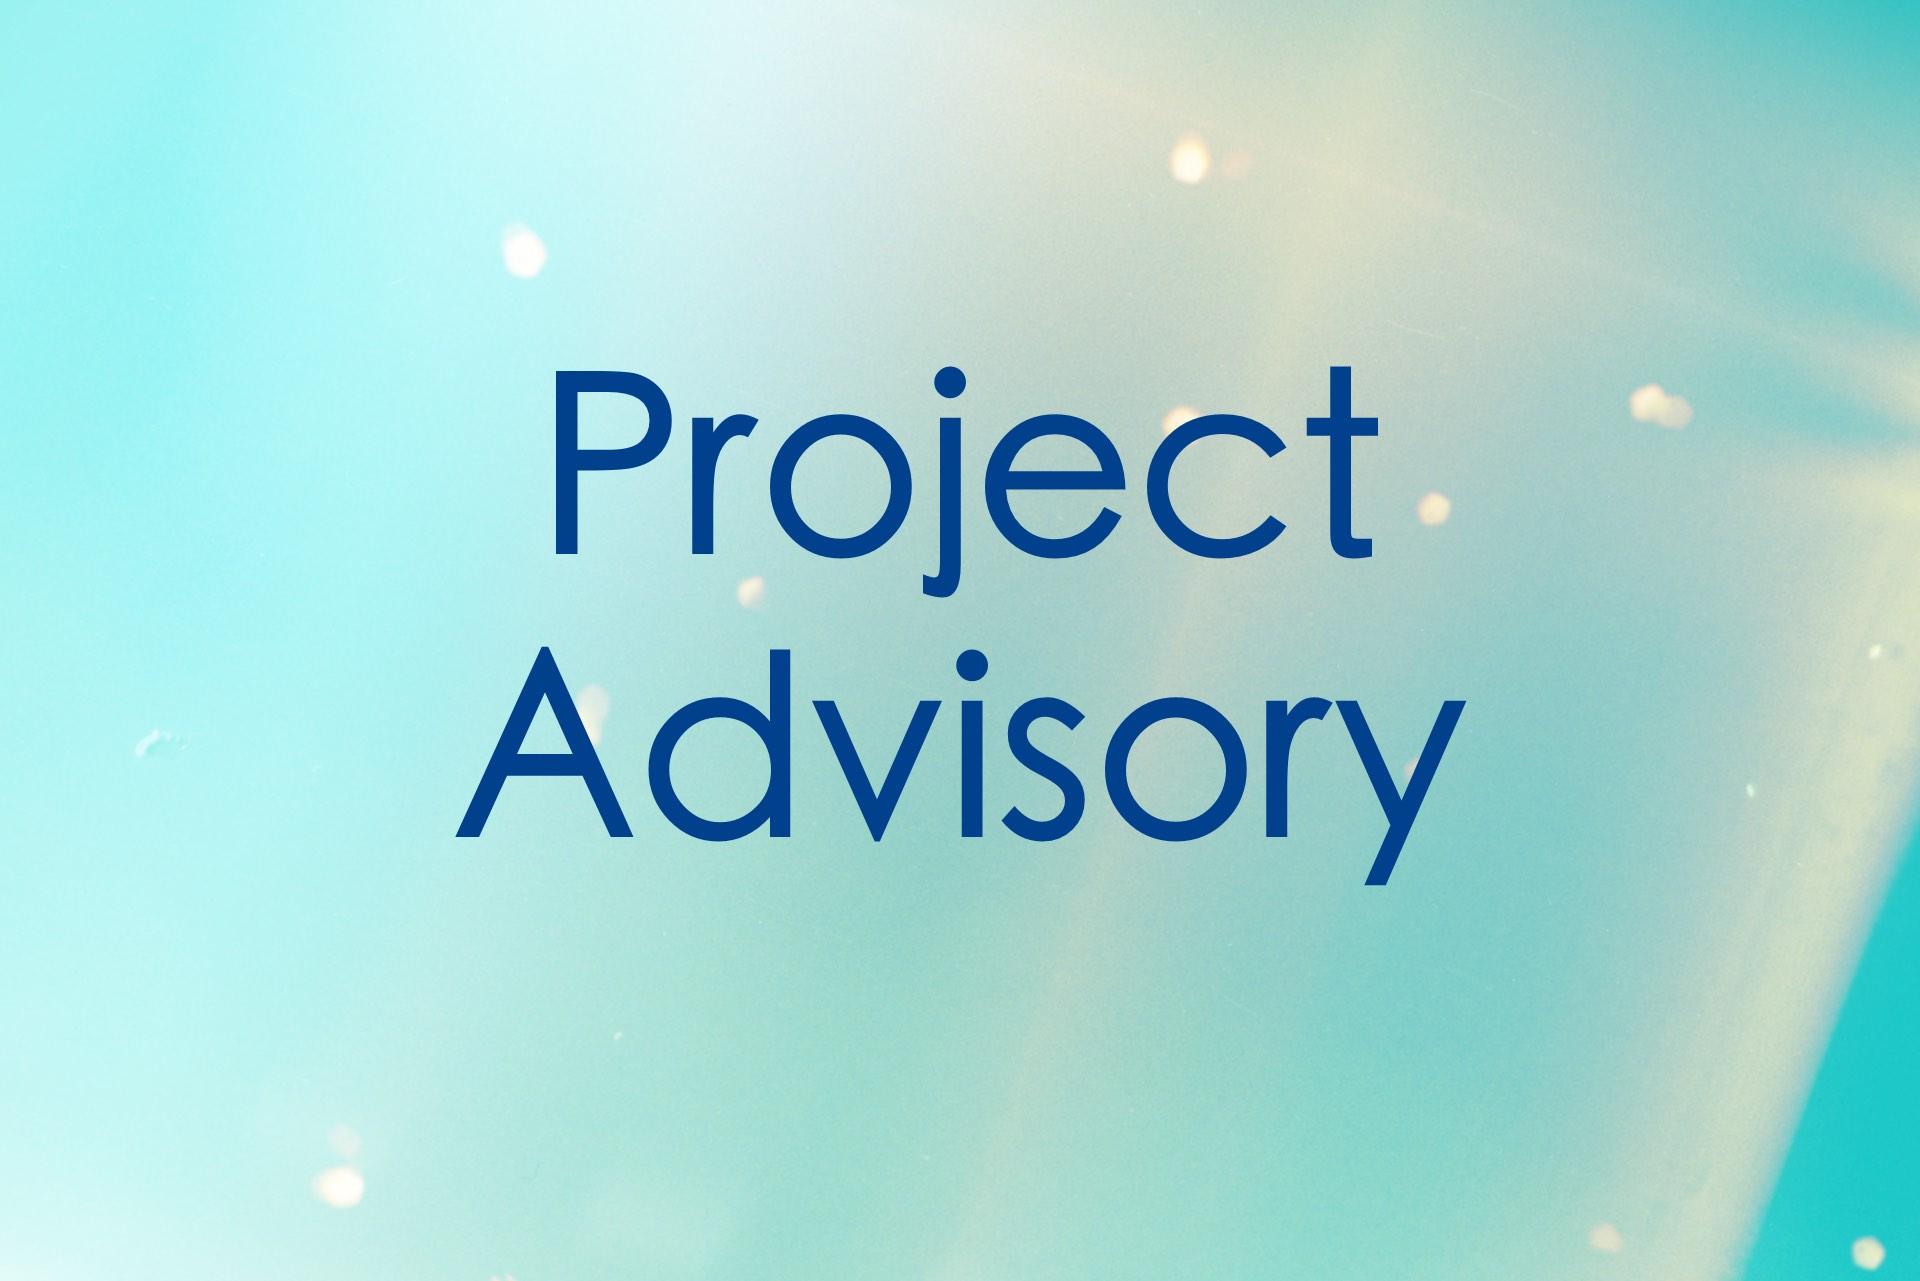 project advisory.jpg